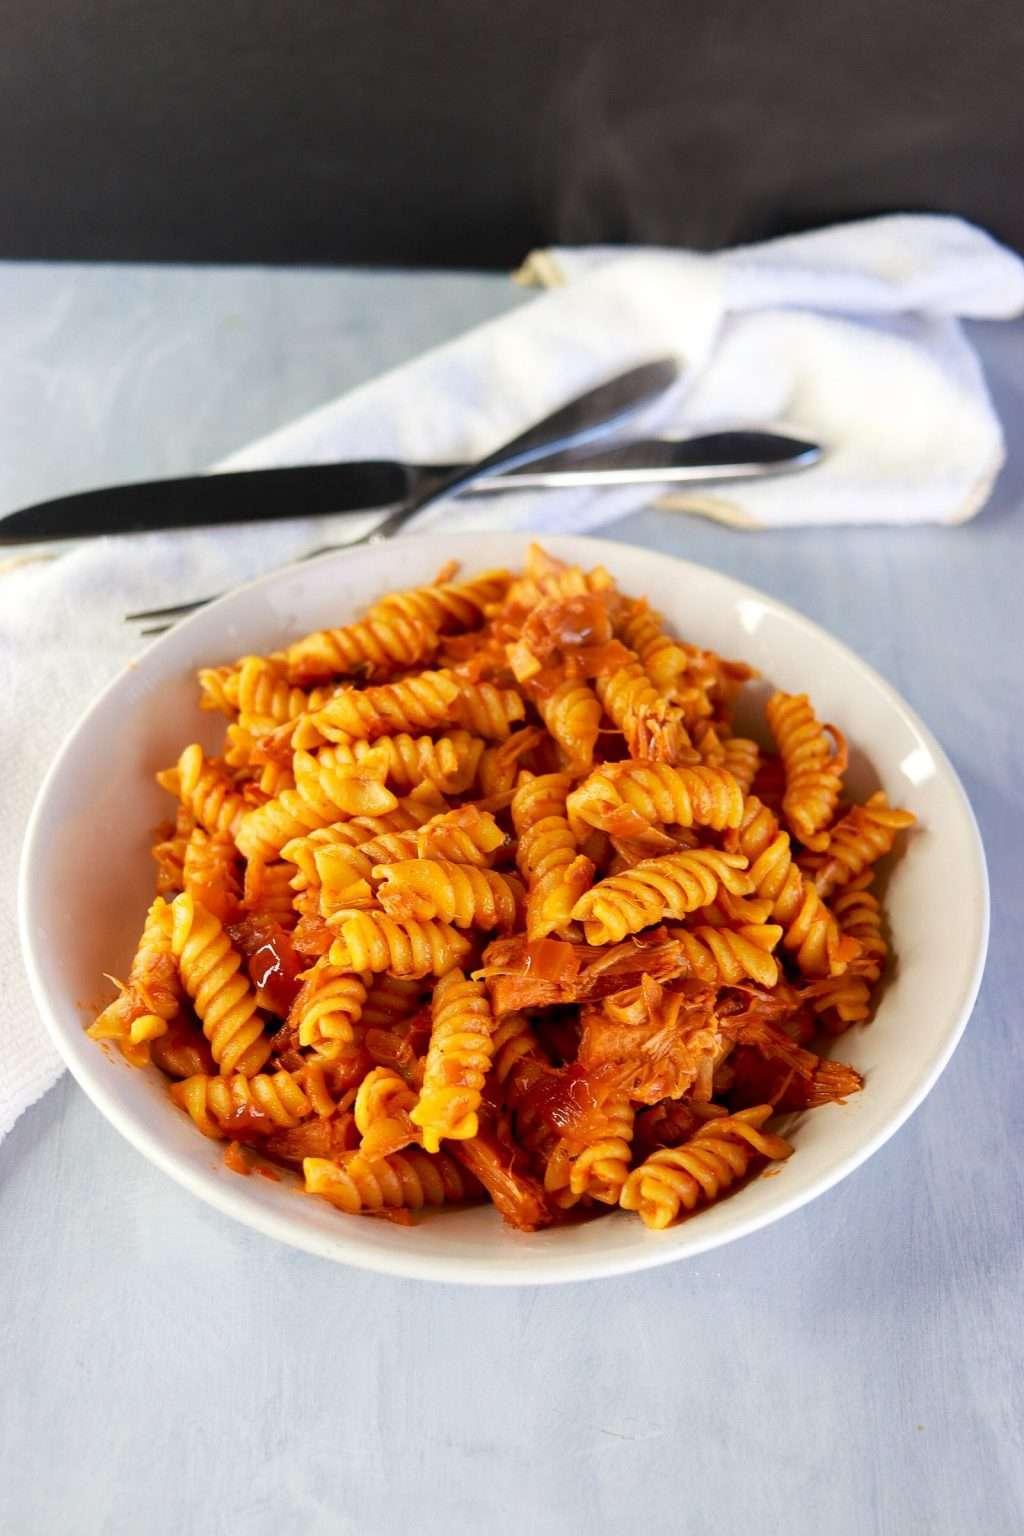 Jackfruit rotini pasta recipe 4189 1024x1536 - Jackfruit Rotini Pasta Recipe: Super Easy & Vegan